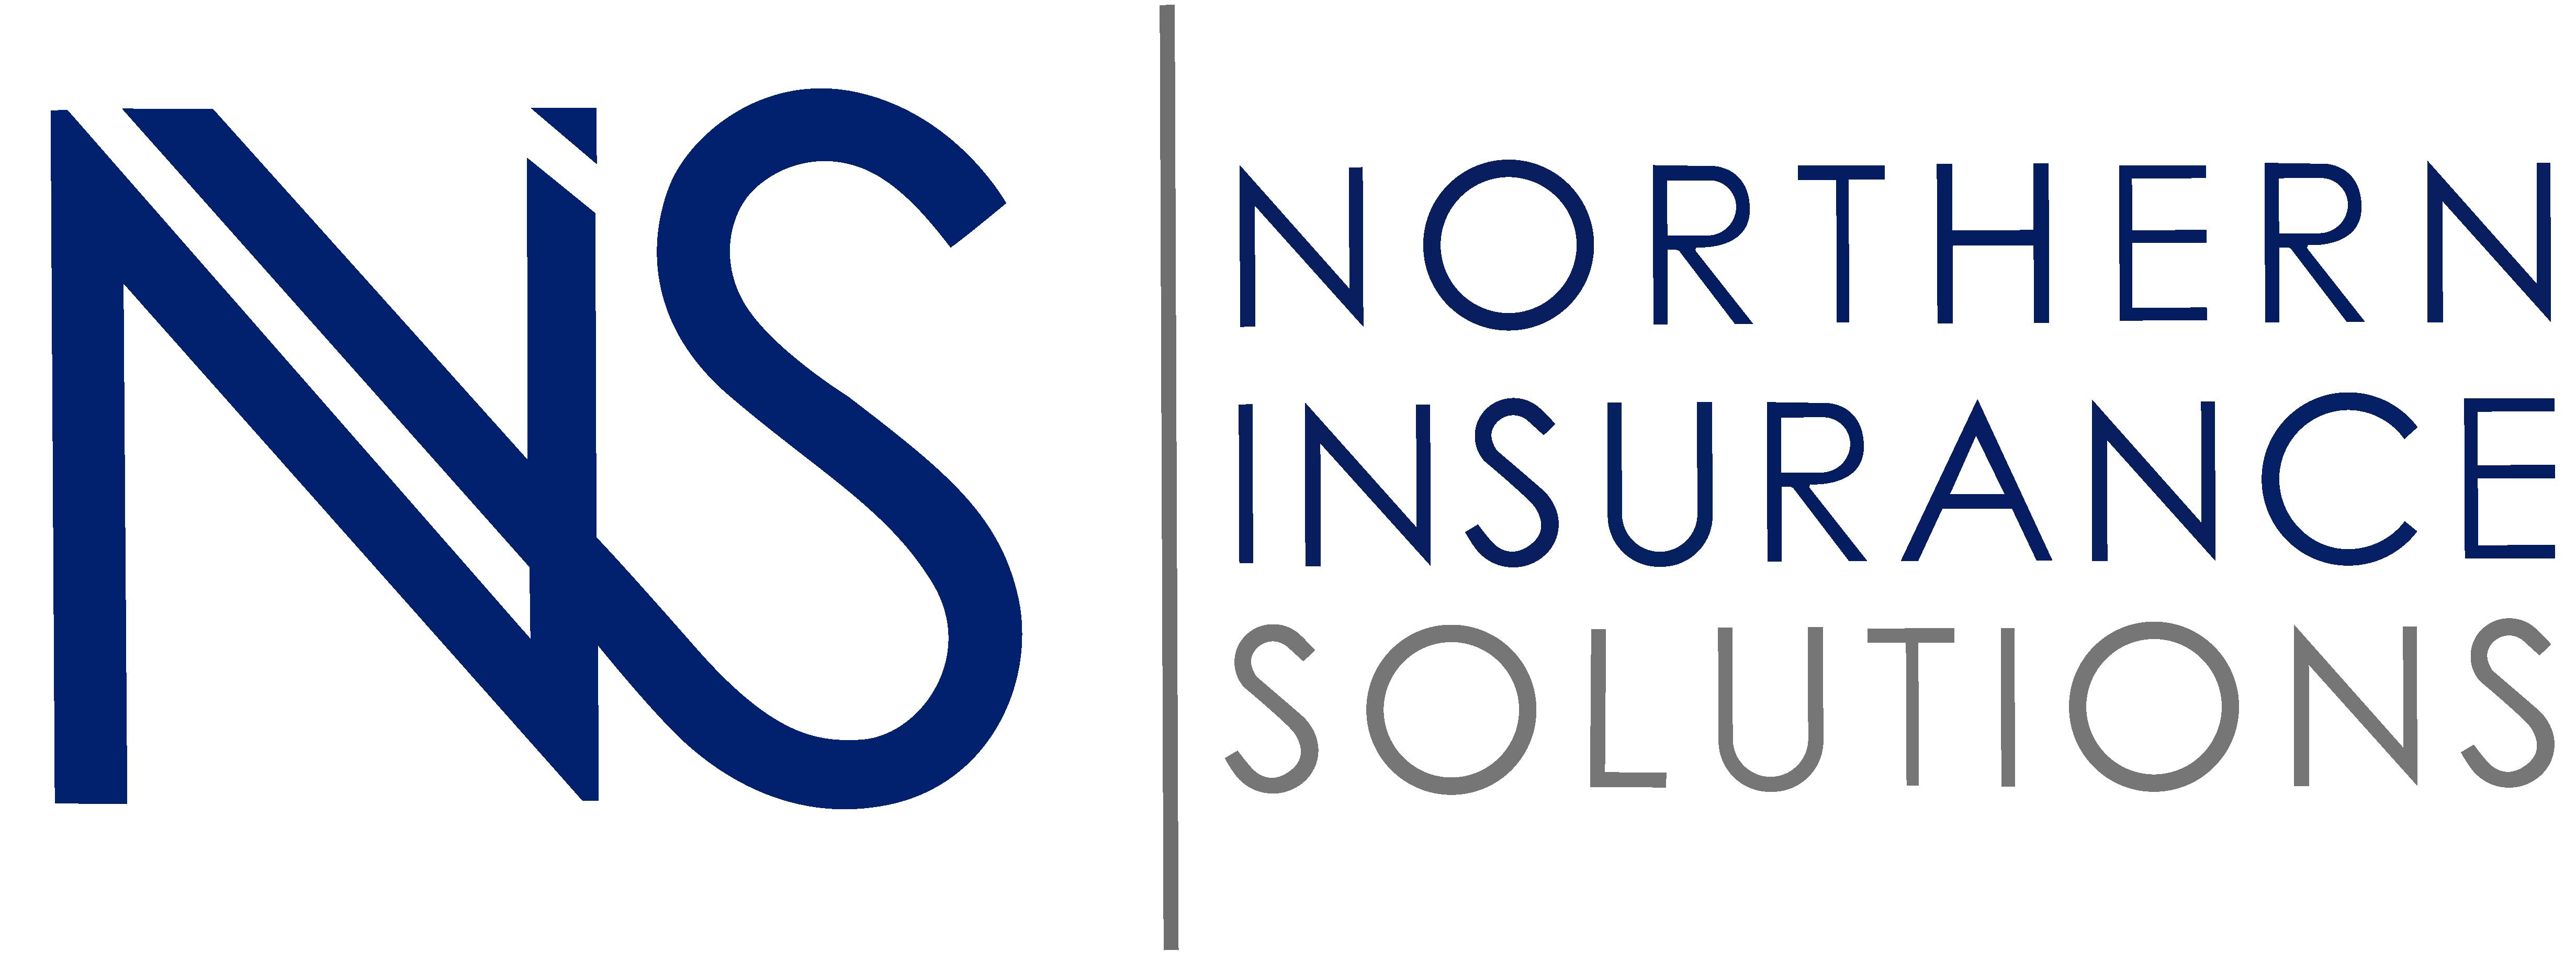 northern-insurance-solutions-pty-ltd